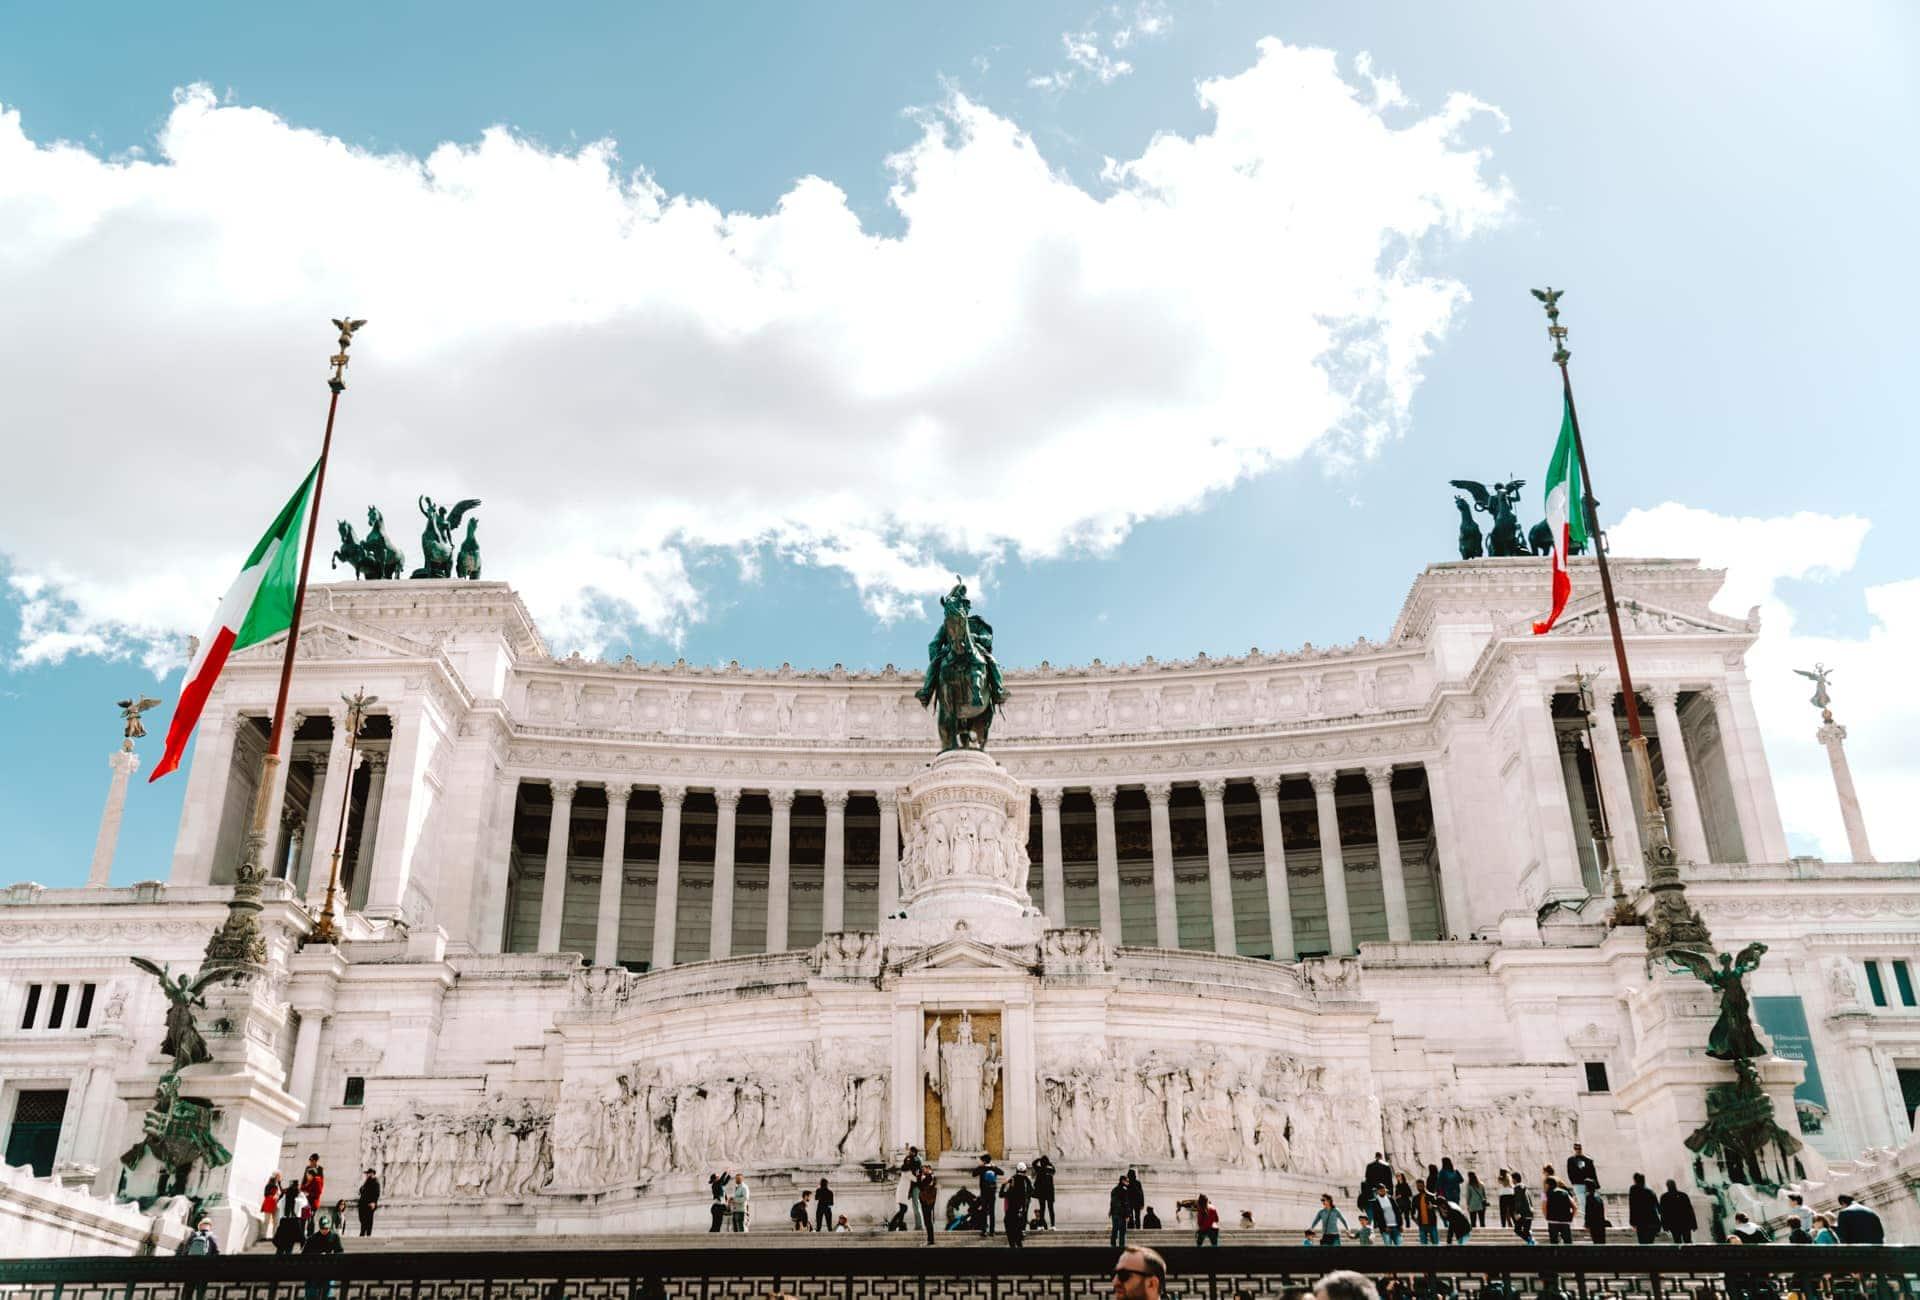 bezienswaardigheden rome Altare Della Patria monument